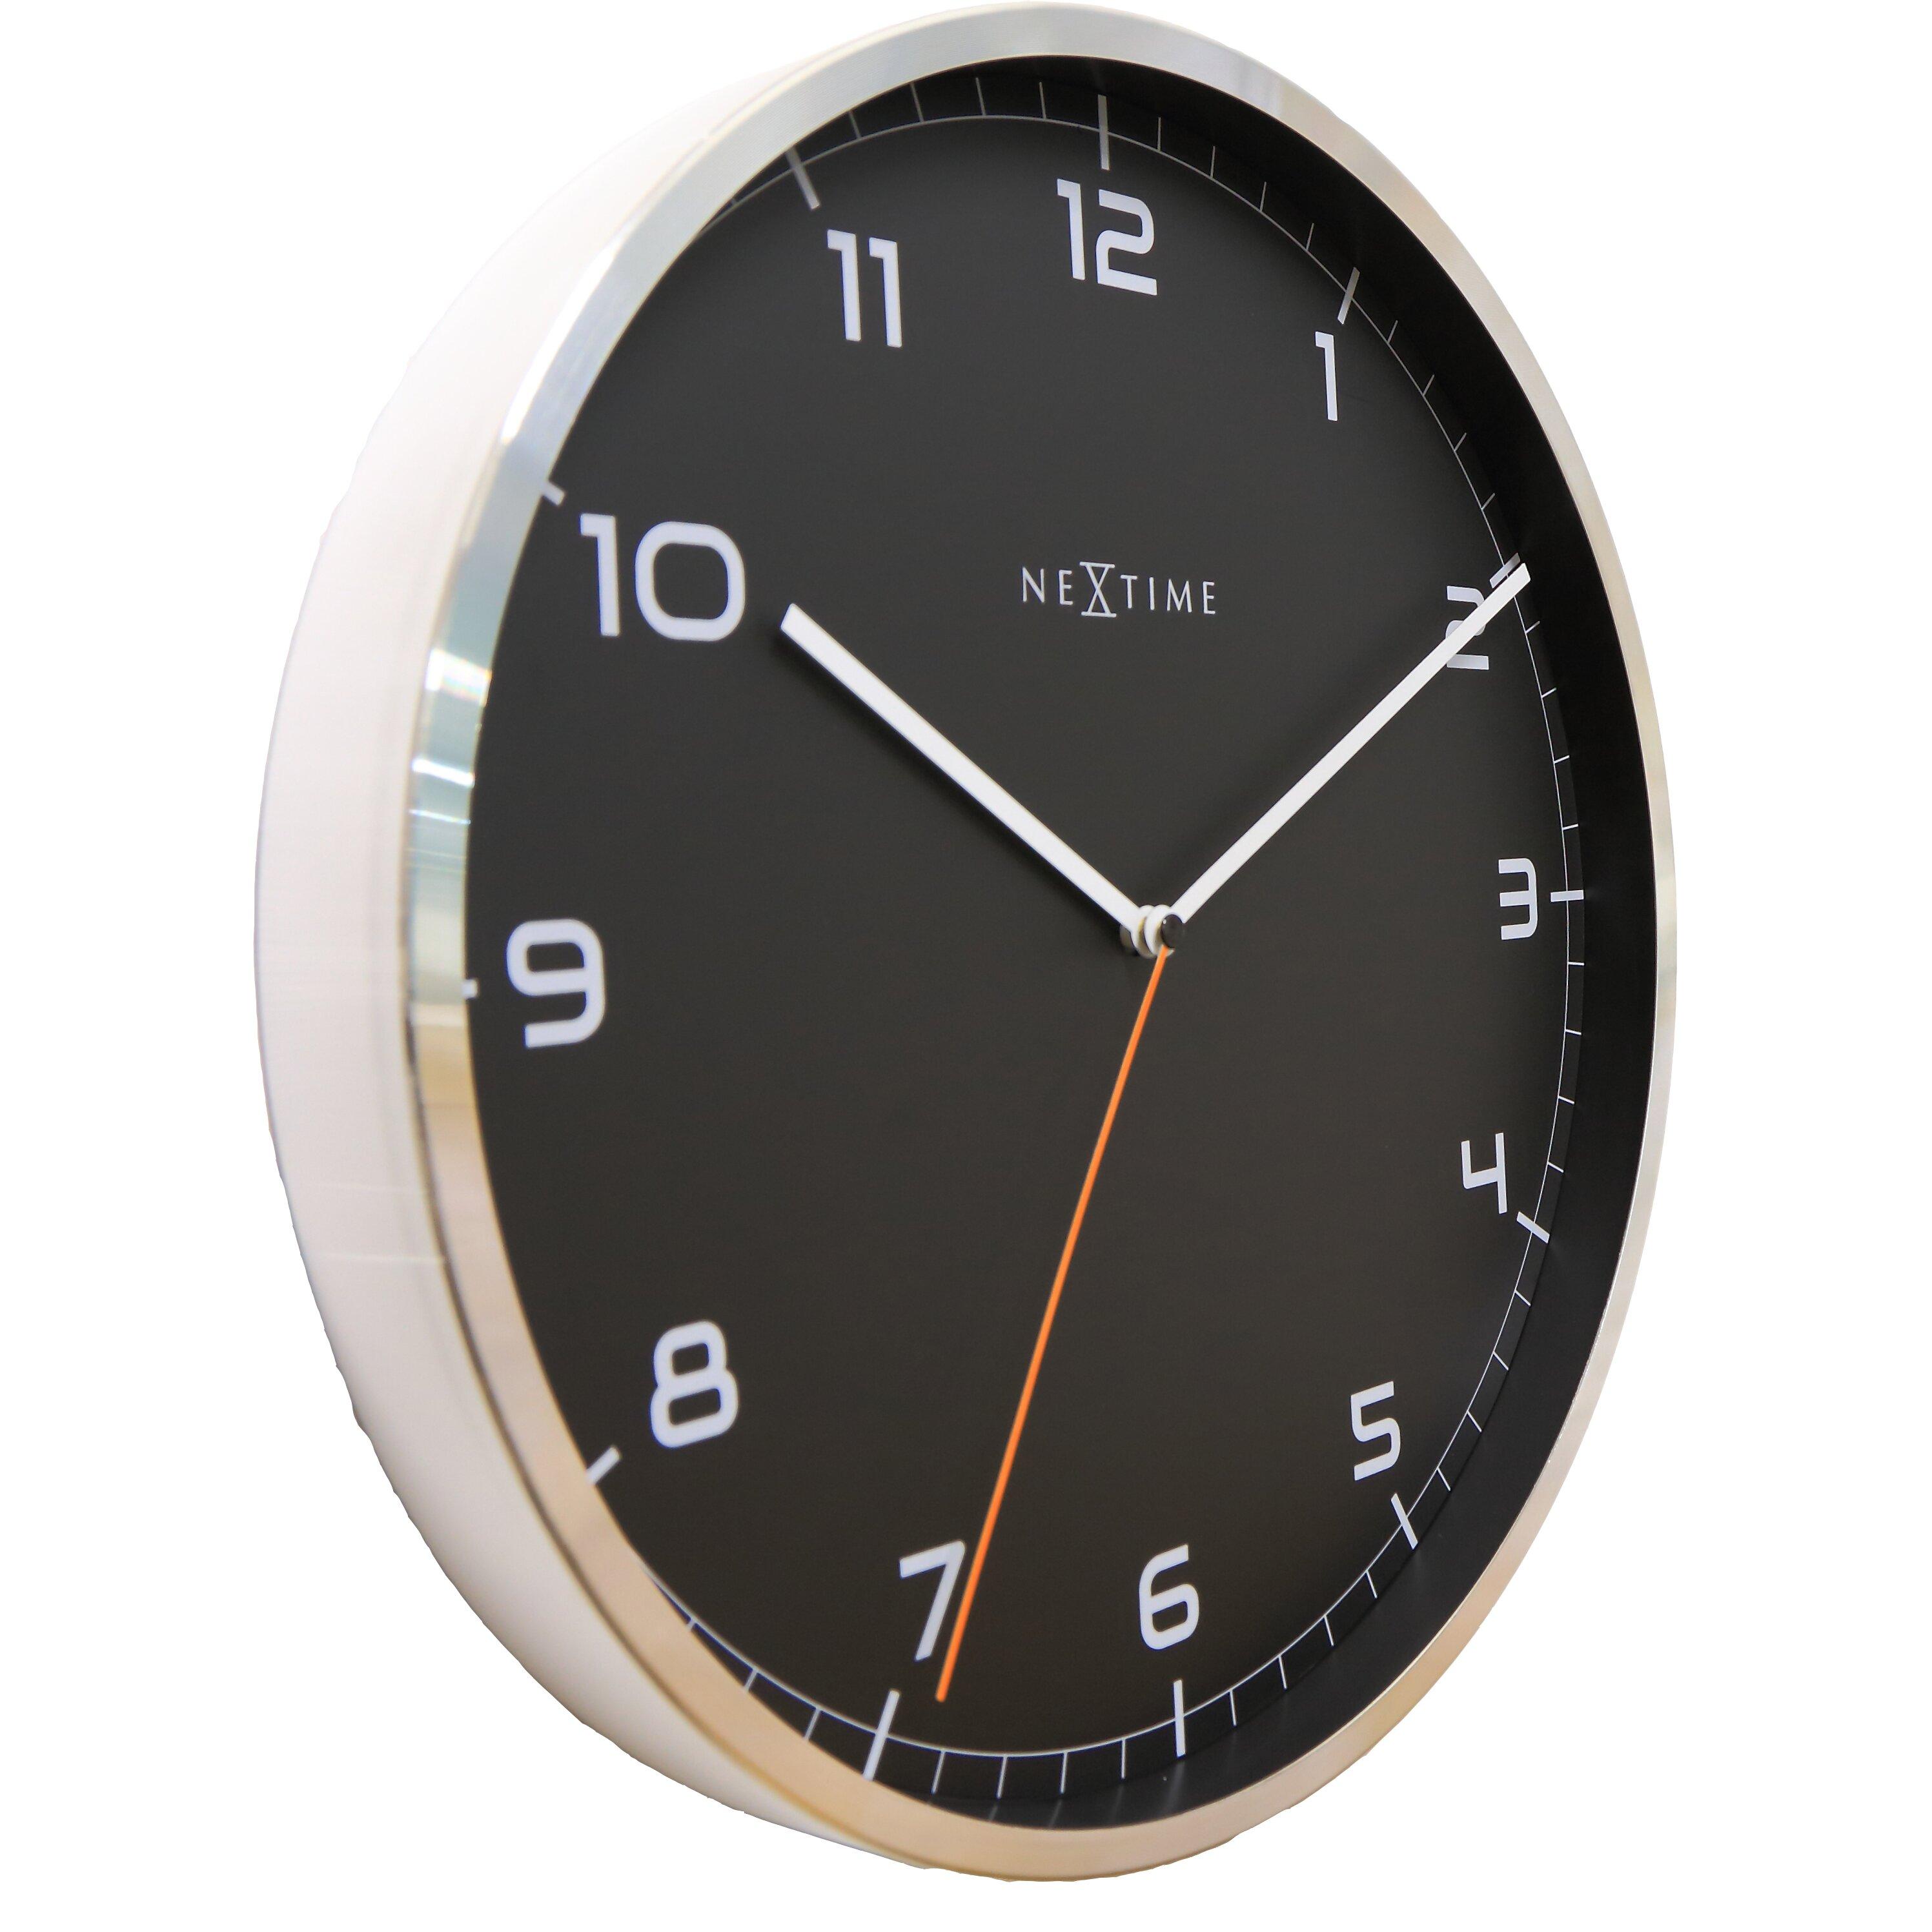 Nextime Company 35 Cm Arabic Numbers Wall Clock Wayfair Uk